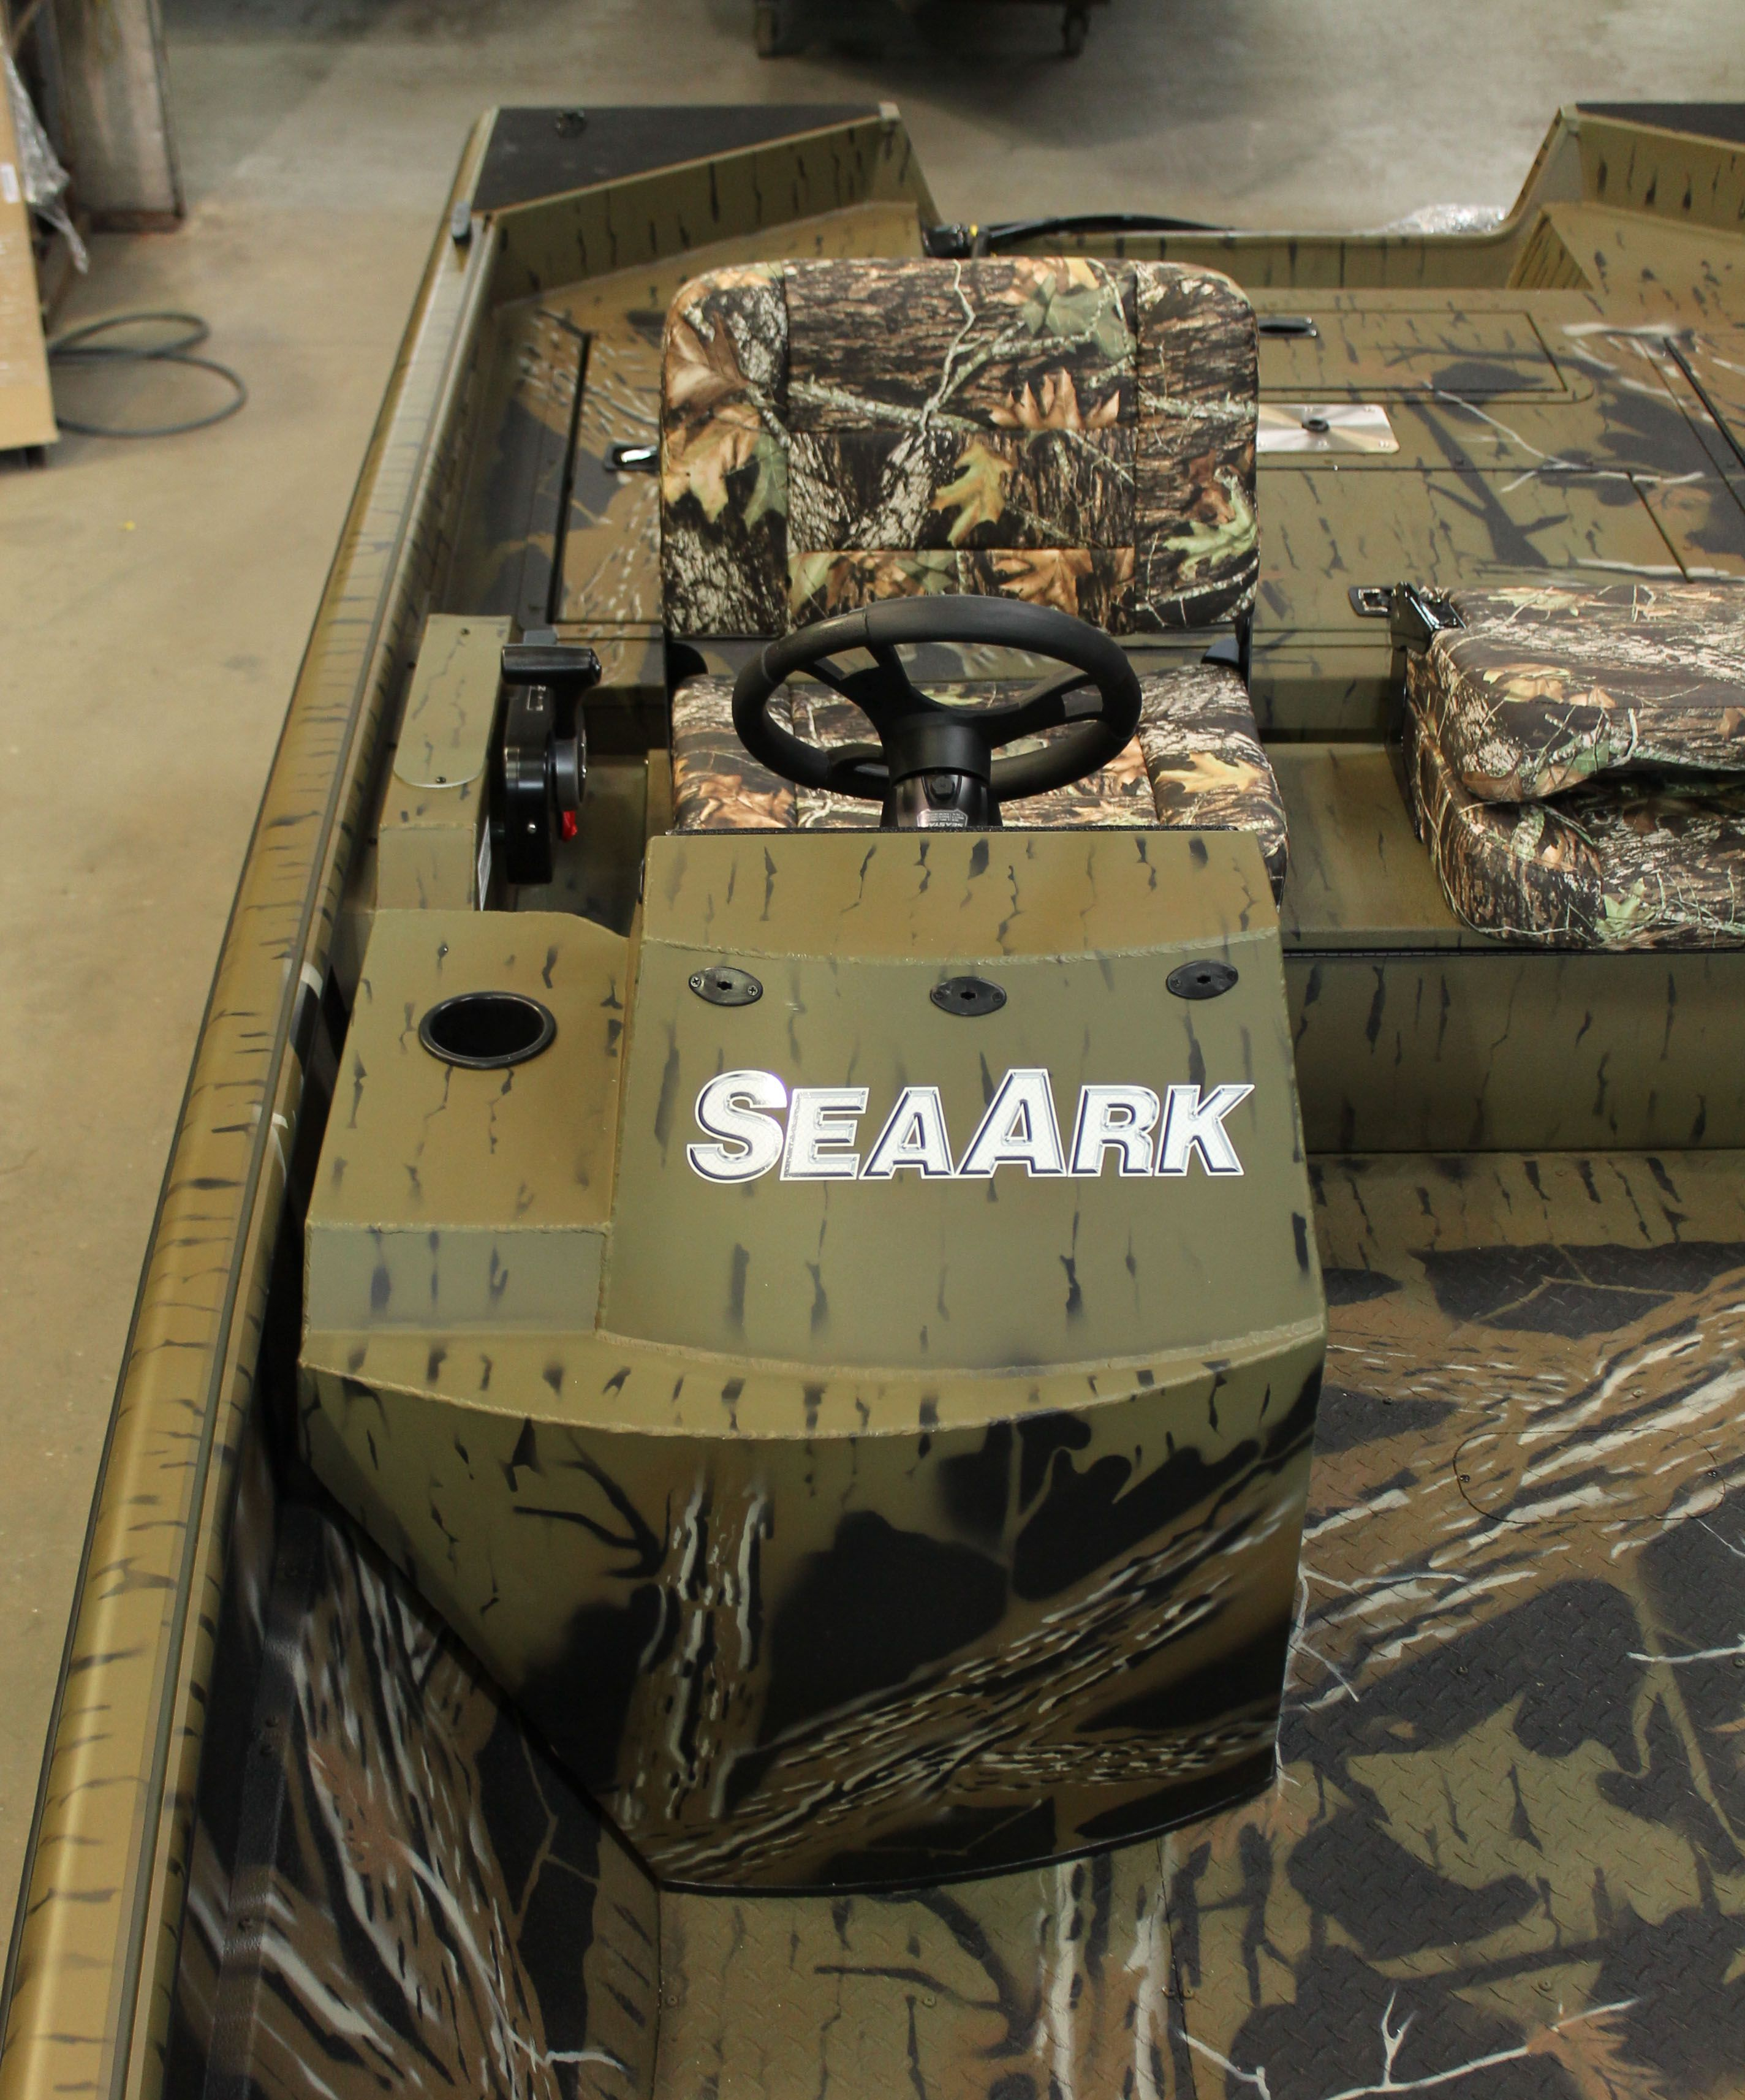 [DIAGRAM_38DE]  Aluminum Side Mount Console no Box - SeaArk Boats - Arkansas | Boat, Boat  building, Boat restoration | Seaark 24v Trolling Motor Wiring Diagram |  | Pinterest